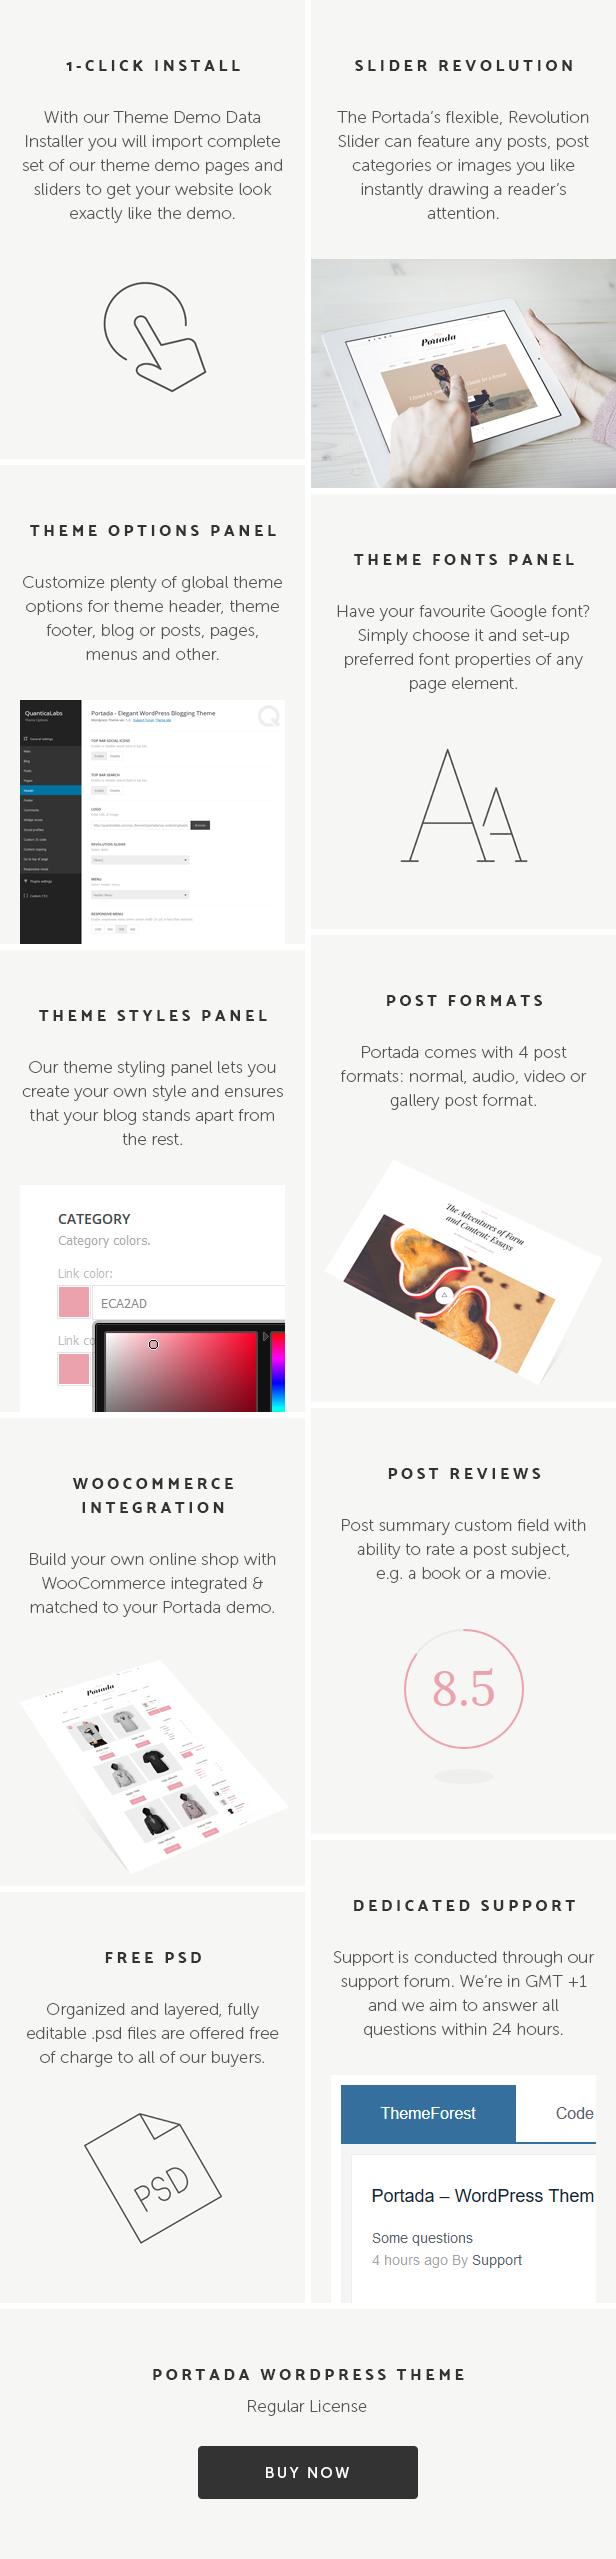 Blog, Magazin, Redaktion, Lifestyle, Blogging WordPress Layout